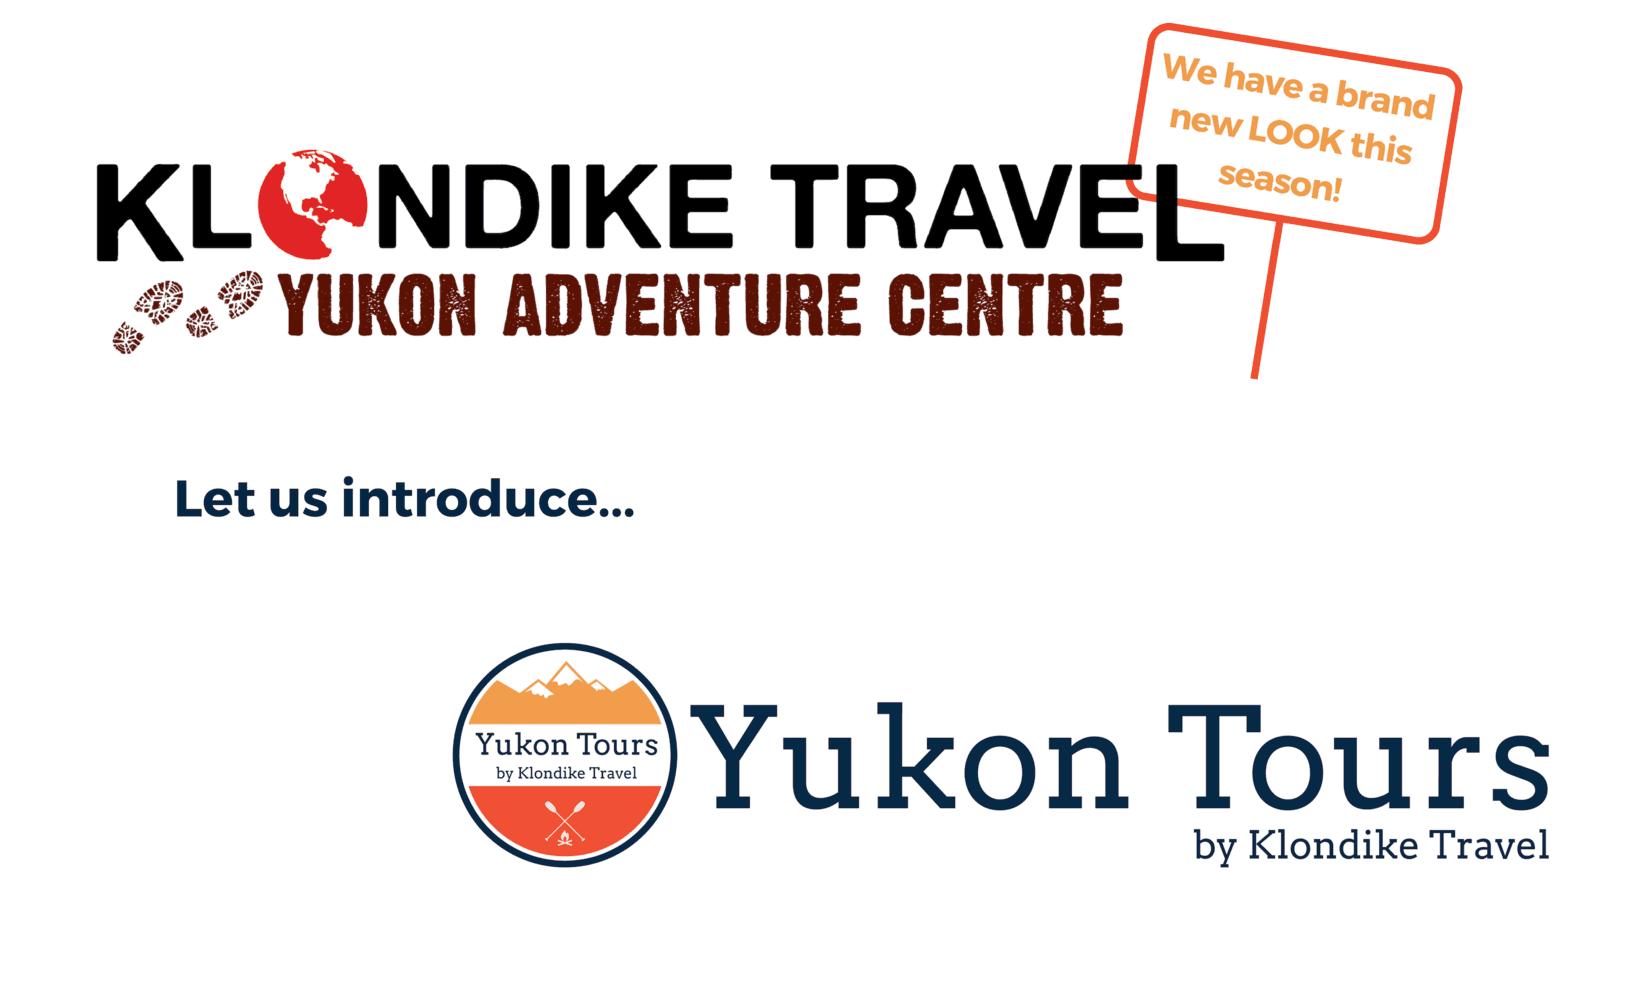 Yukon Adventure Centre has a NEW Look!